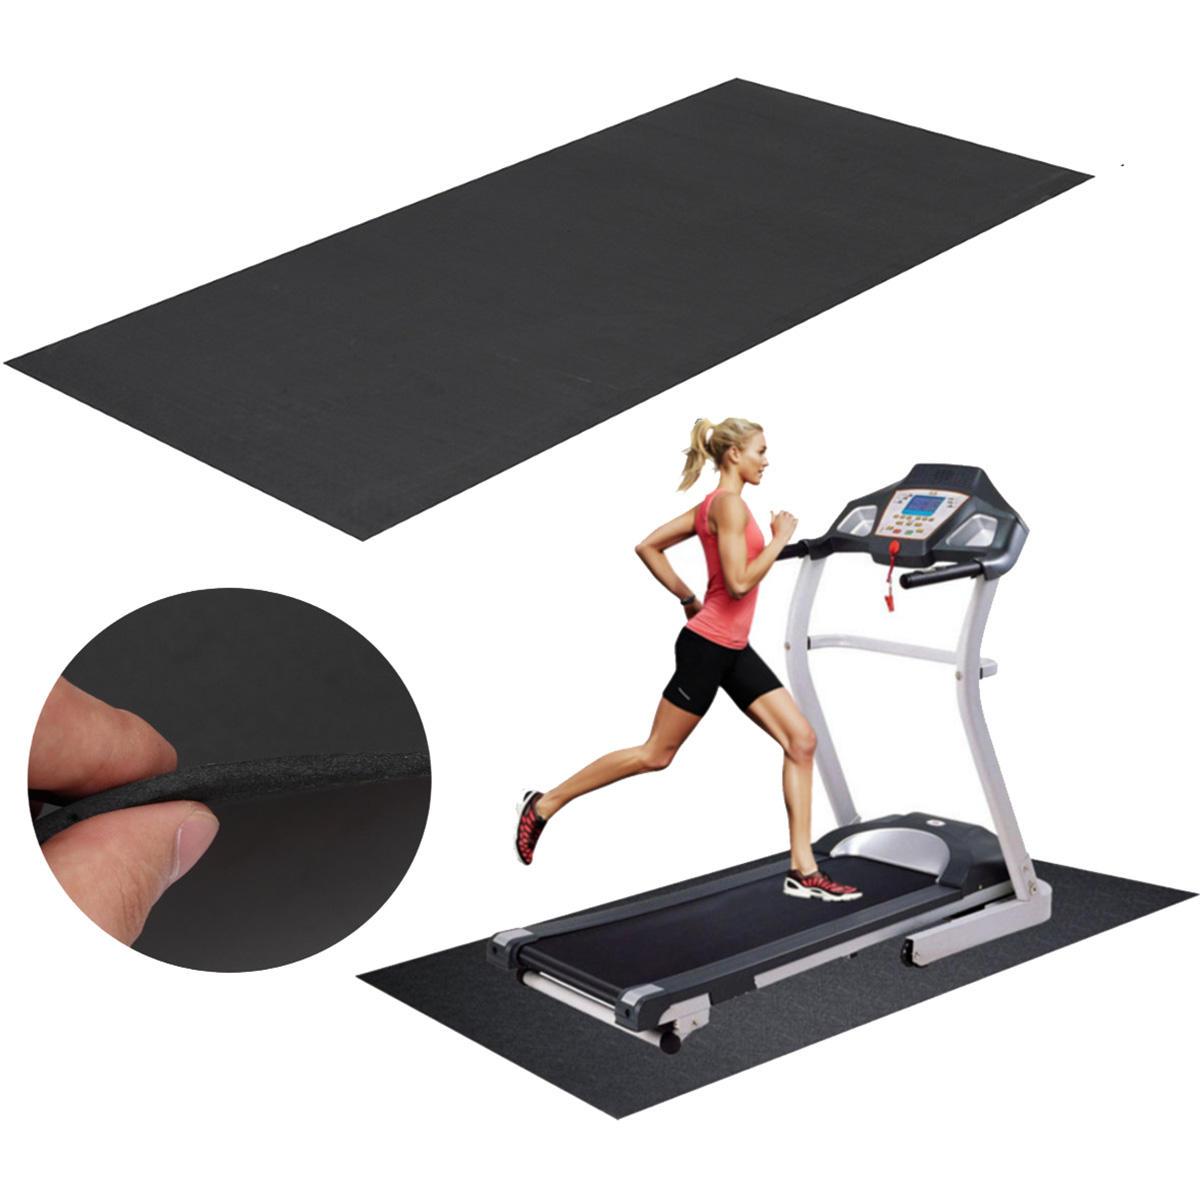 150x75cm Black Treadmill Mat Outdoor Sports Fitness Yoga Mats Running Machine Pad